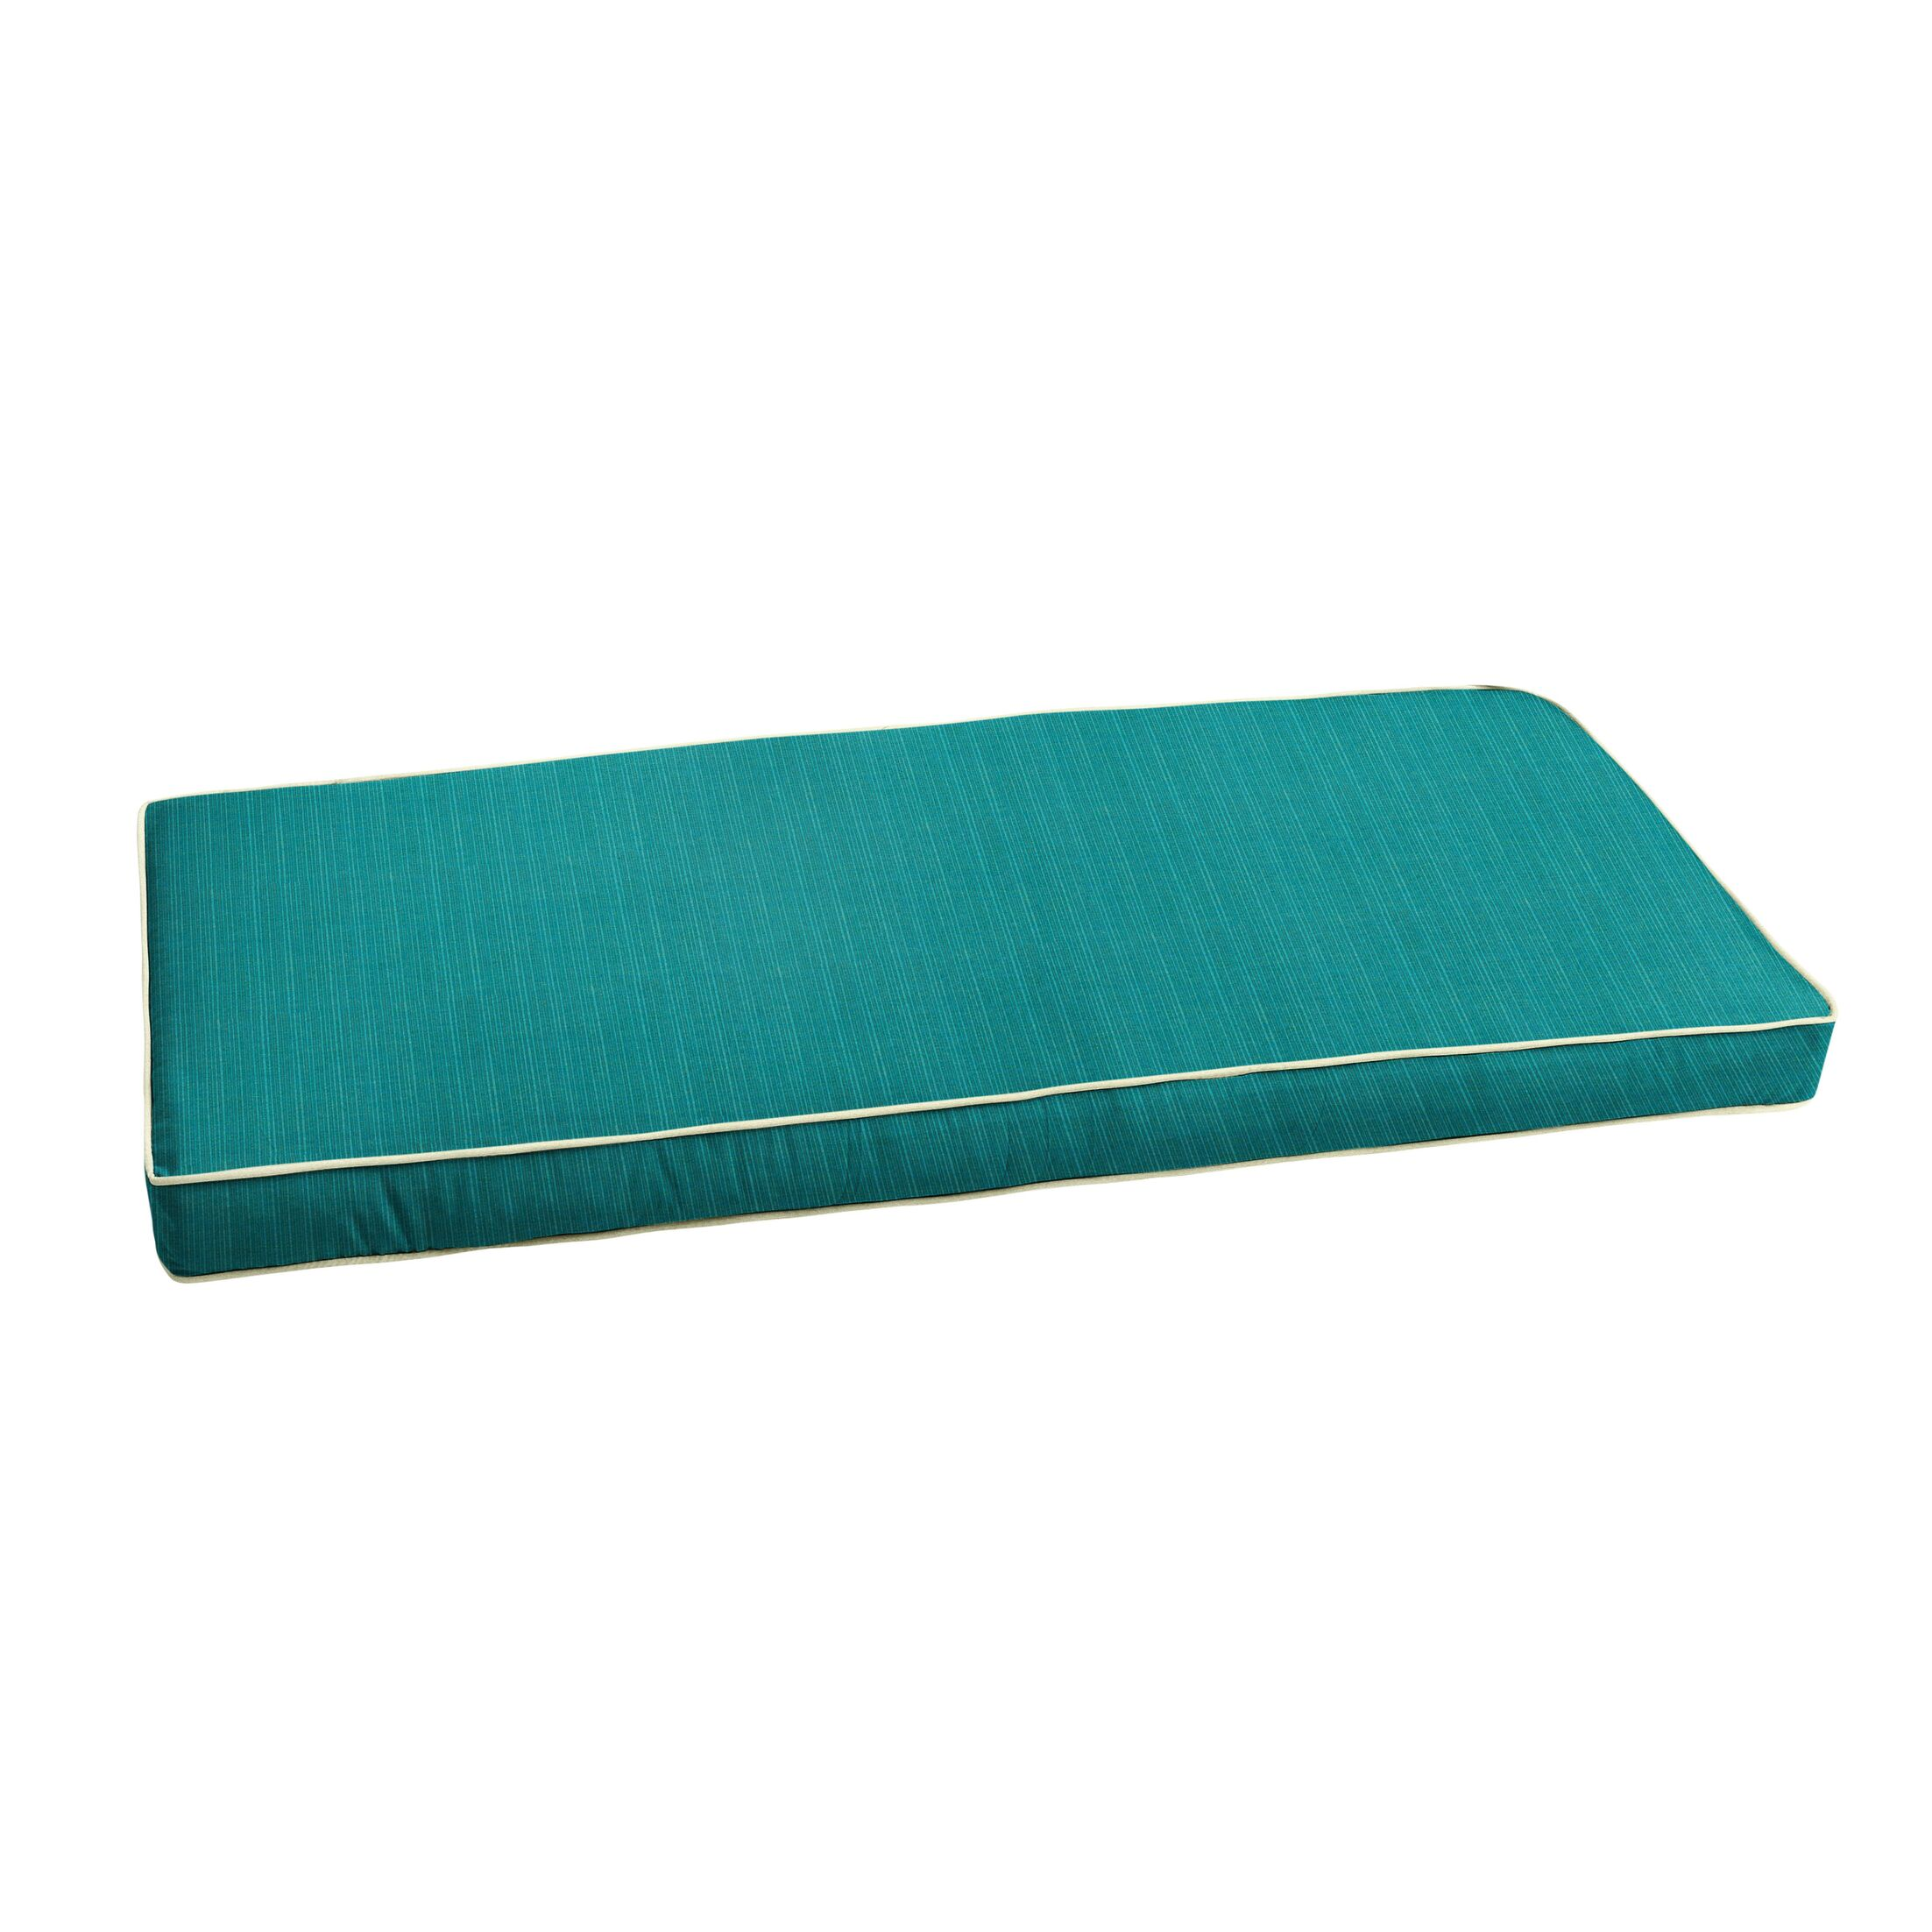 Textured Indoor/Outdoor Sunbrella Bench Cushion Size: 44